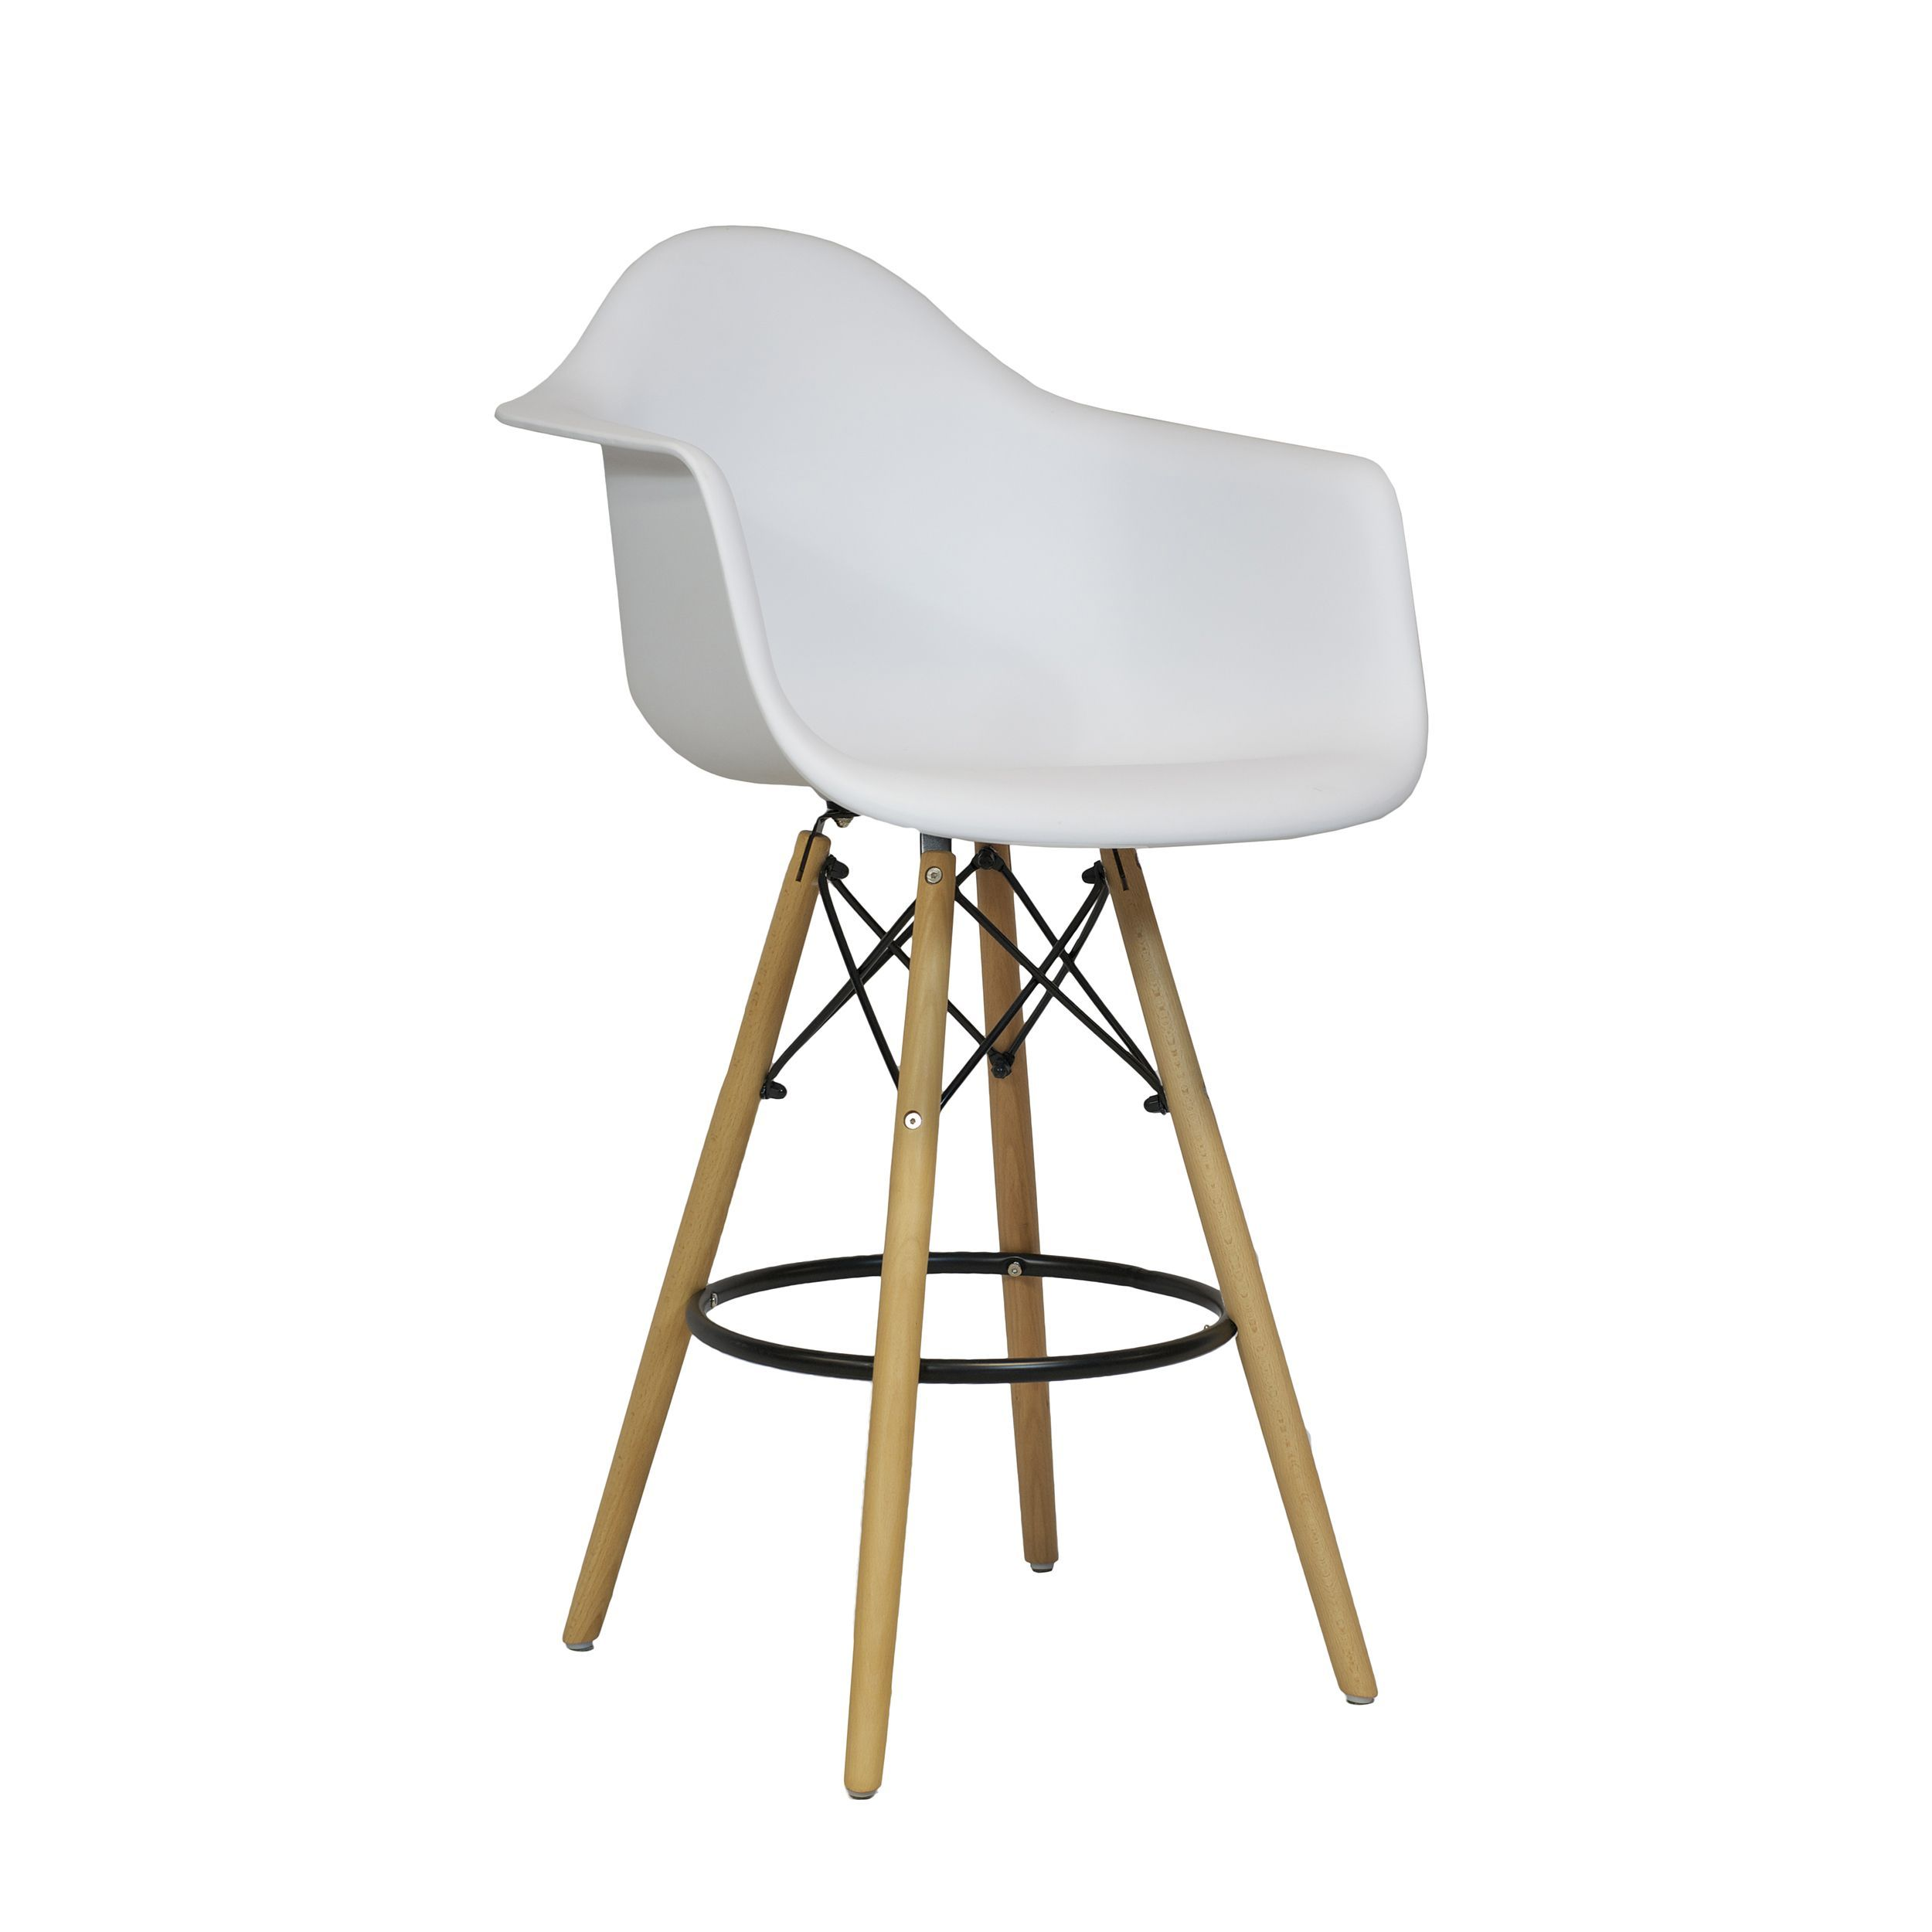 Handmade Mid Century Modern Molded Plastic 26 Inch Armchair Counter Stool India Blue Counter Stools Bar Stools Stool